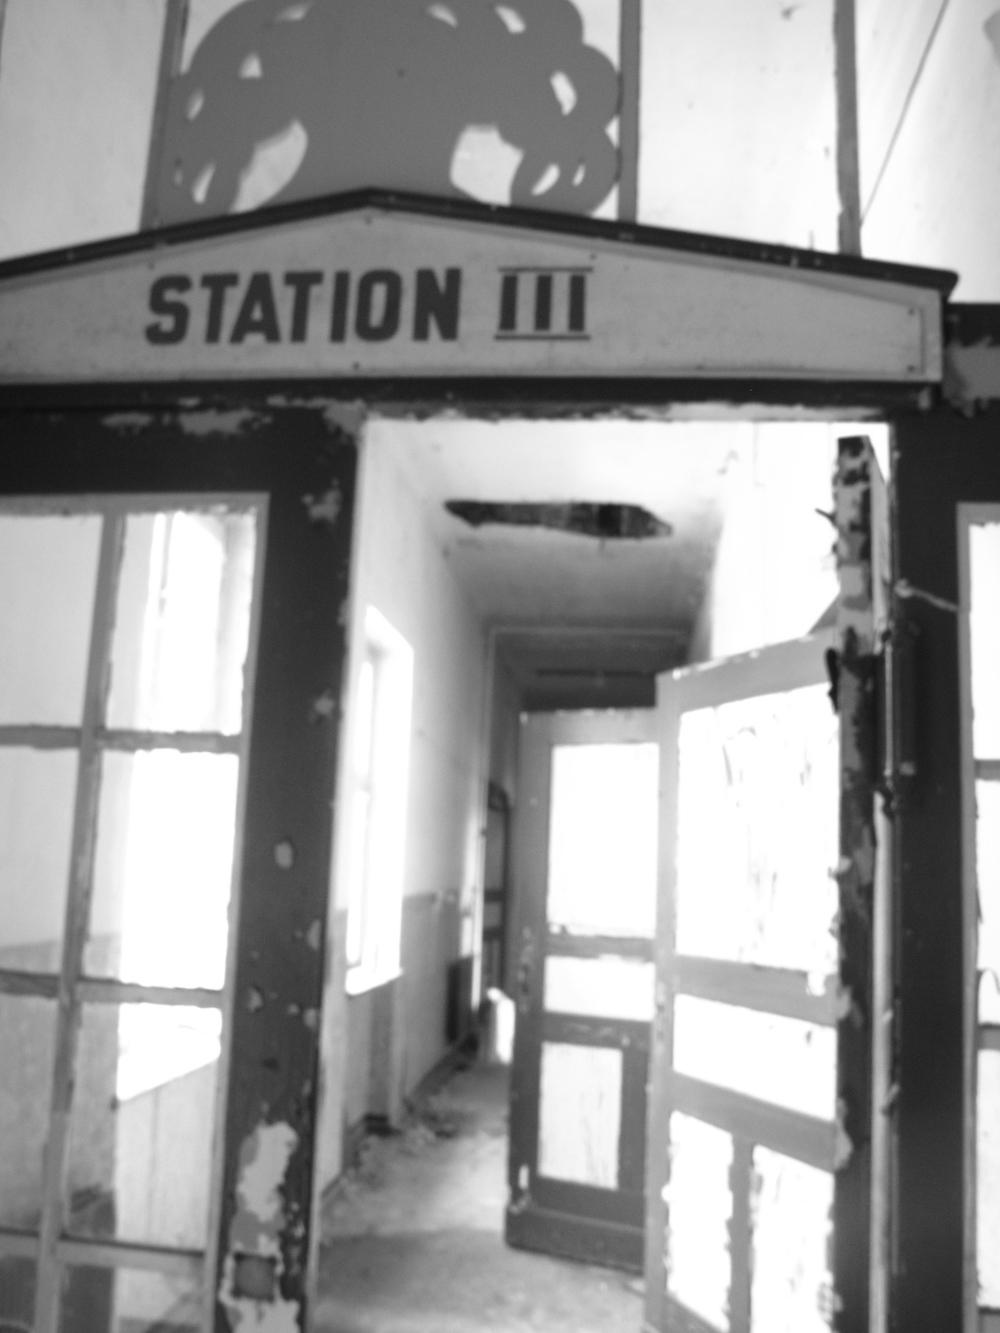 Station II - wards inside Elisabeth Sanatorium